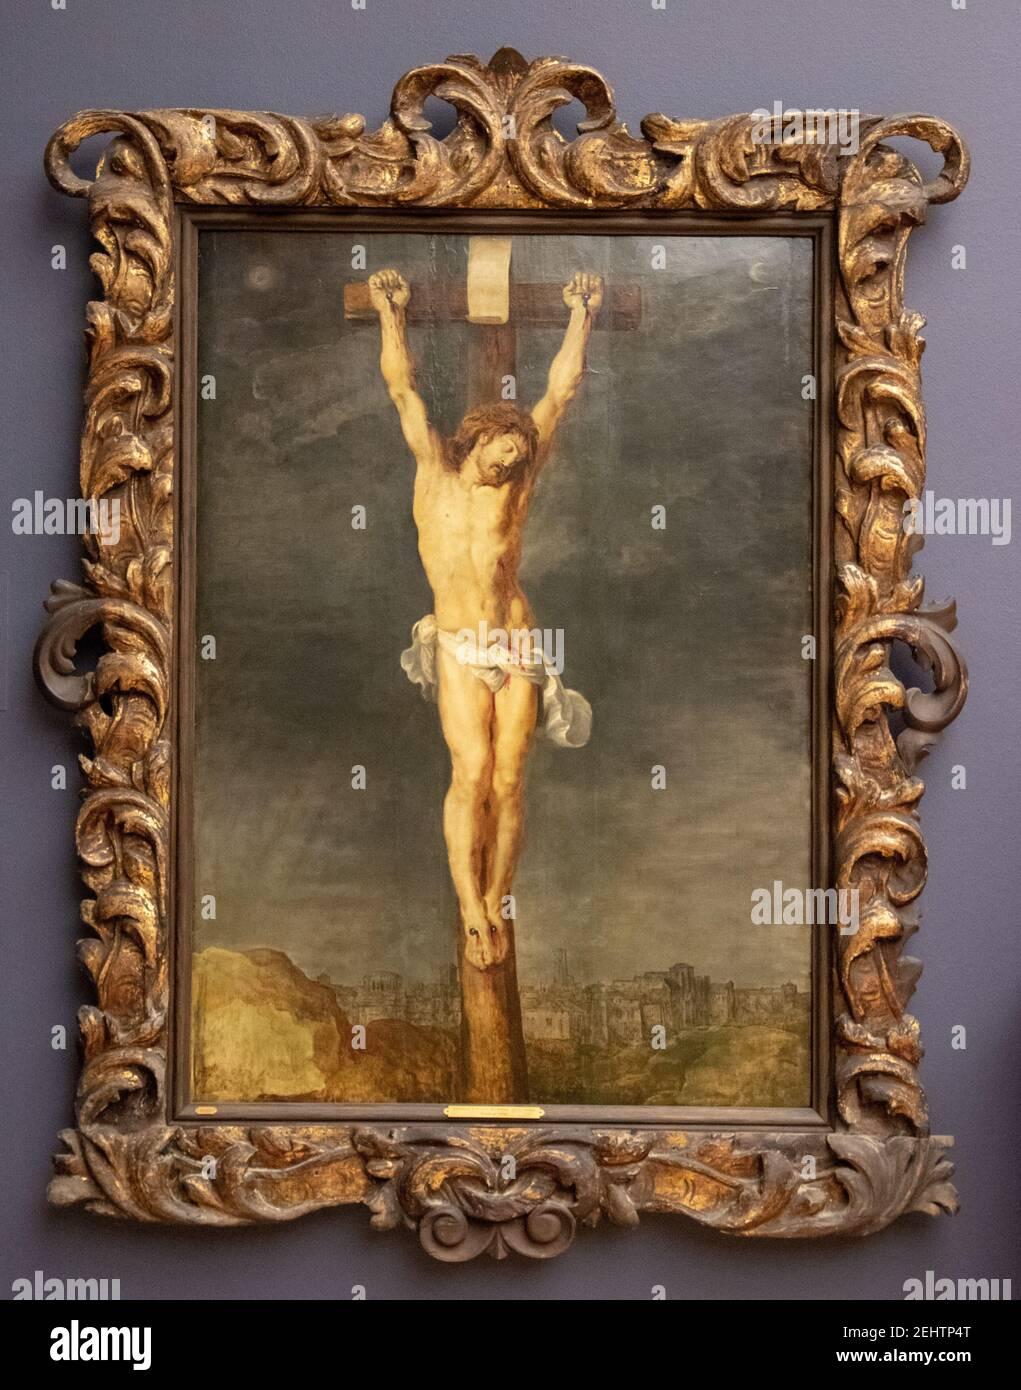 Cristo en la Cruz, Peter Paul Rubens, SMK, Statens Museun for Kunst, Galería Nacional de Dinamarca, Copenhague, Dinamarca. Foto de stock